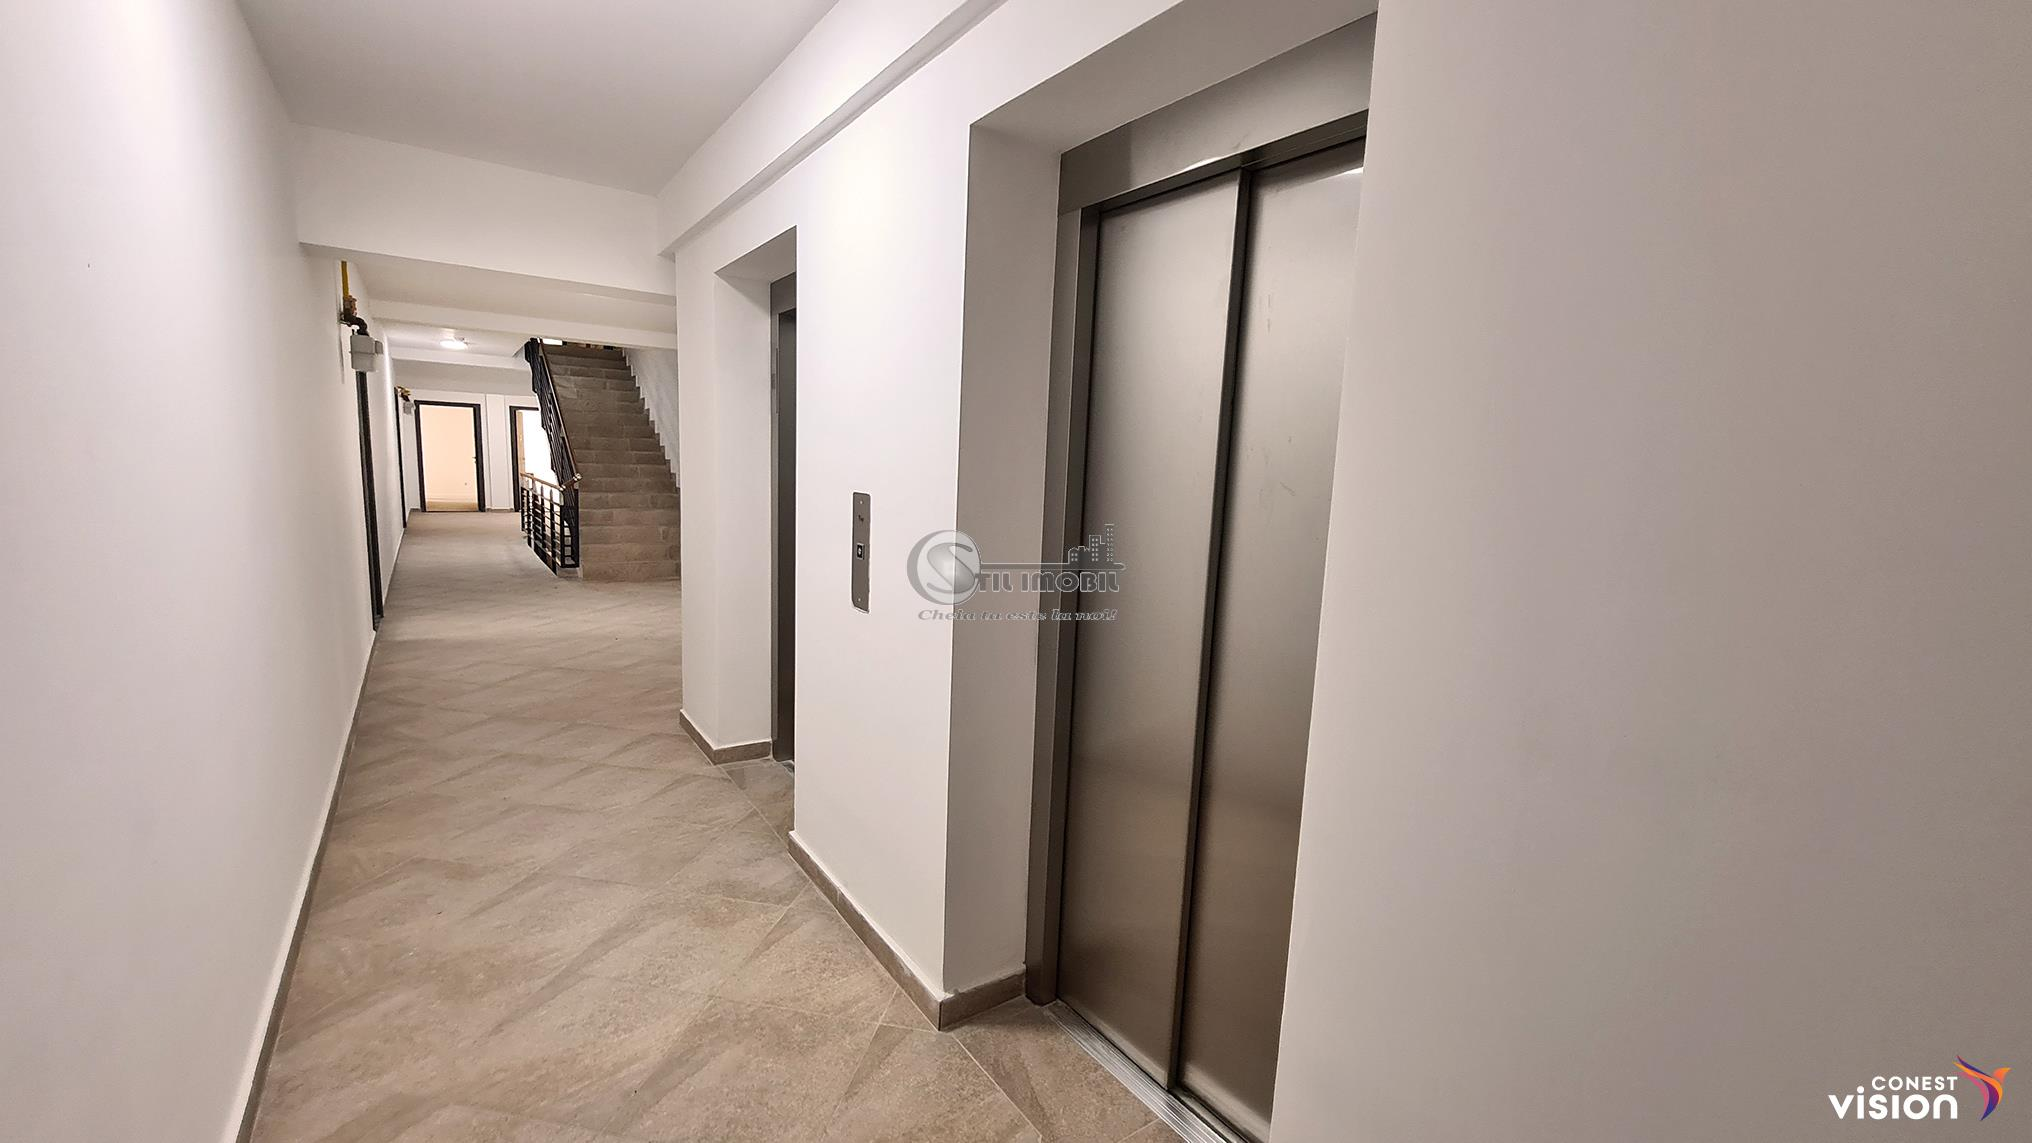 Apartament 1 camera NOU Conest Vision